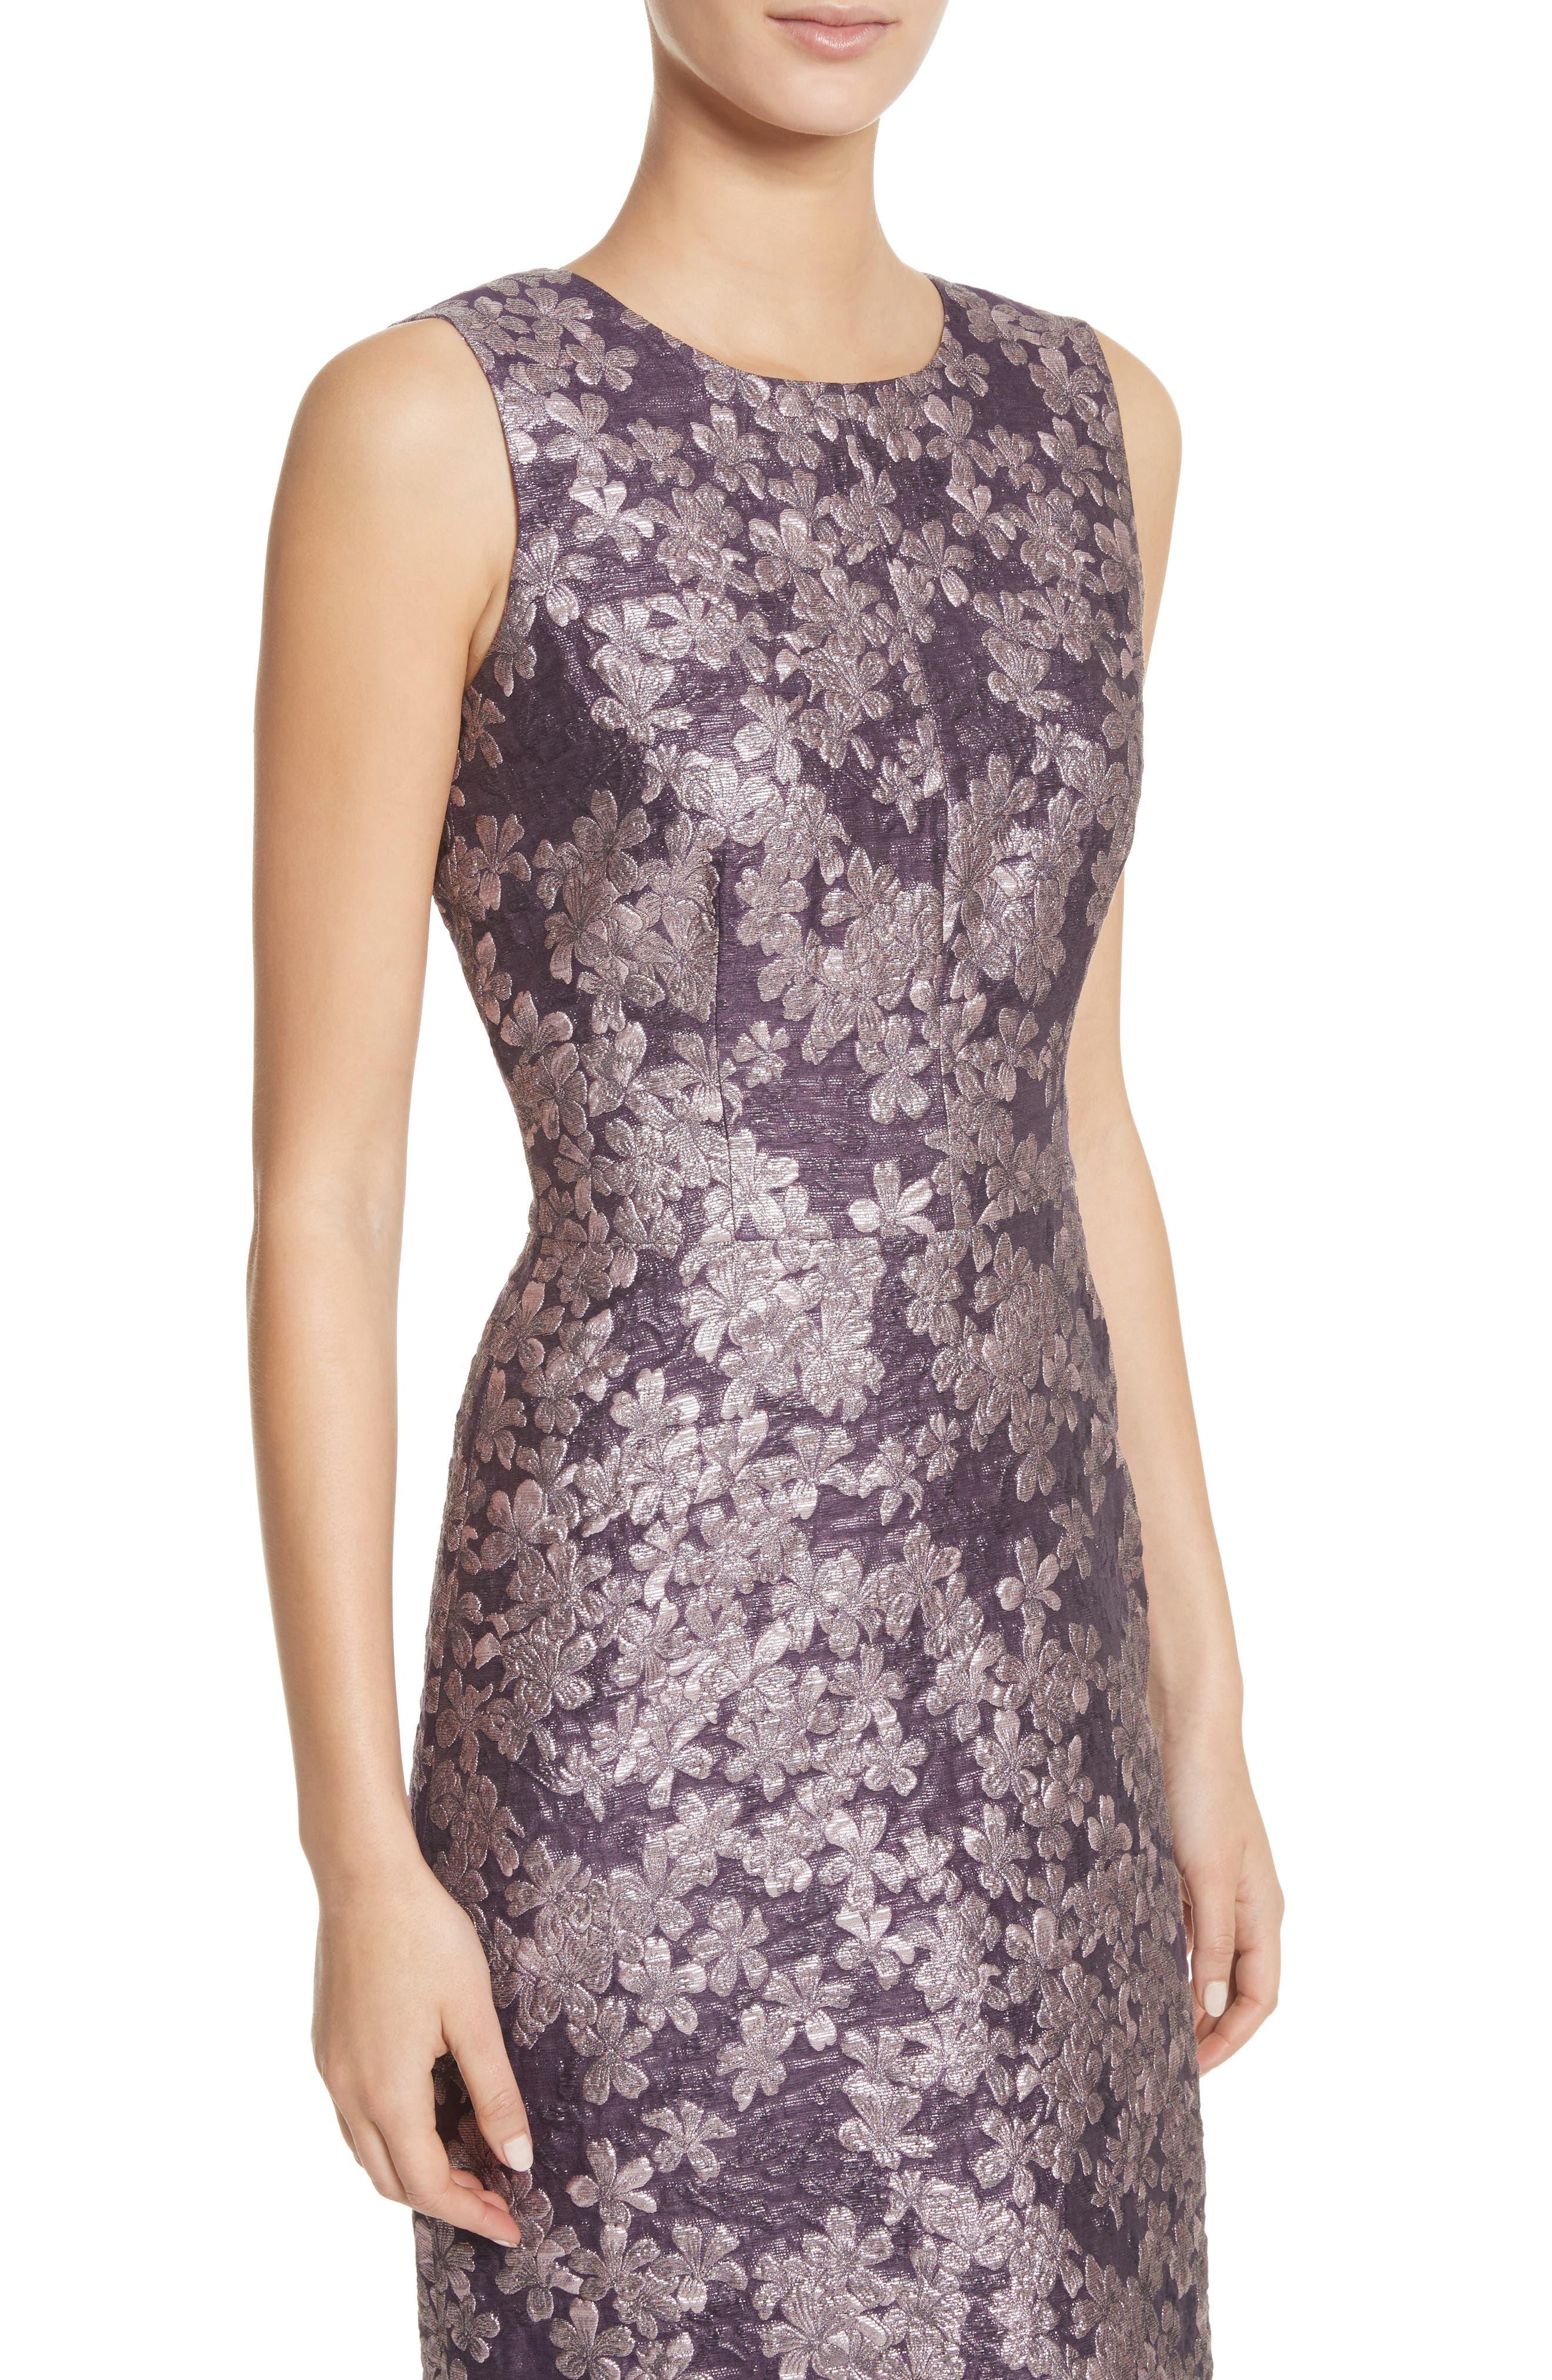 Metallic Floral Jacquard Dress,                             Alternate thumbnail 4, color,                             Orchid Multi